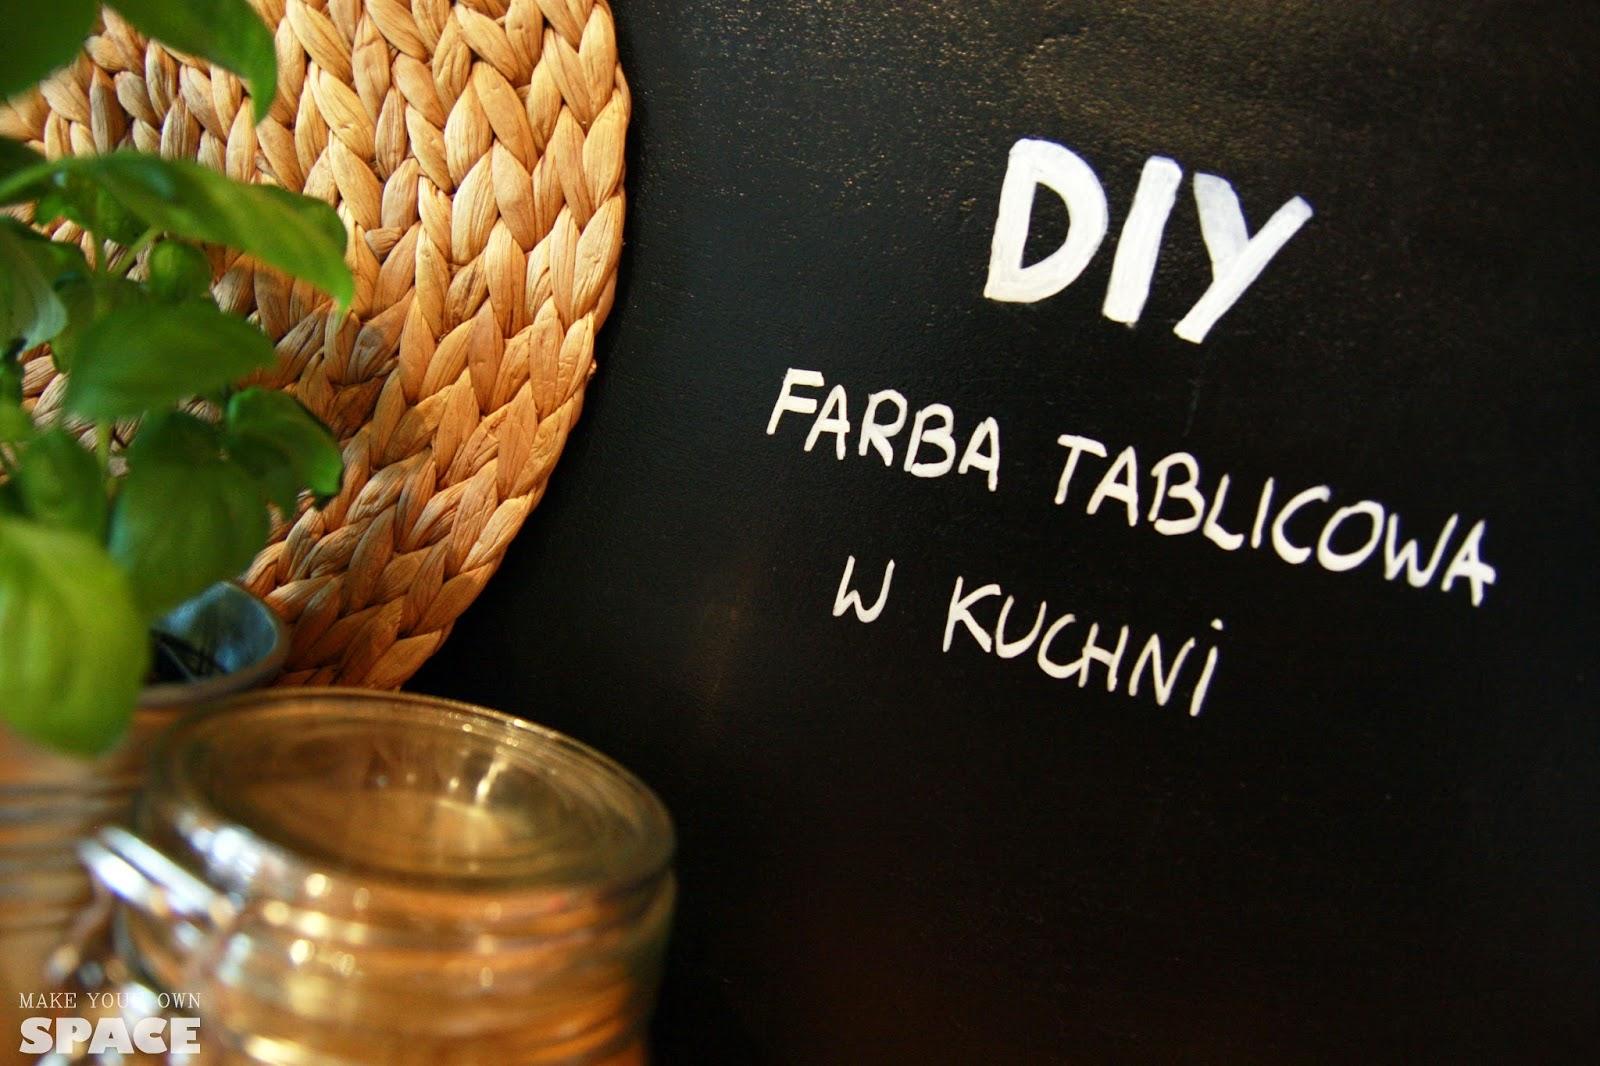 Farba tablicowa, farba tablicowa w kuchni, DIY, Farba tablicowa, Marker kredowy, kuchnia, ściana w kuchni, kuchnia design